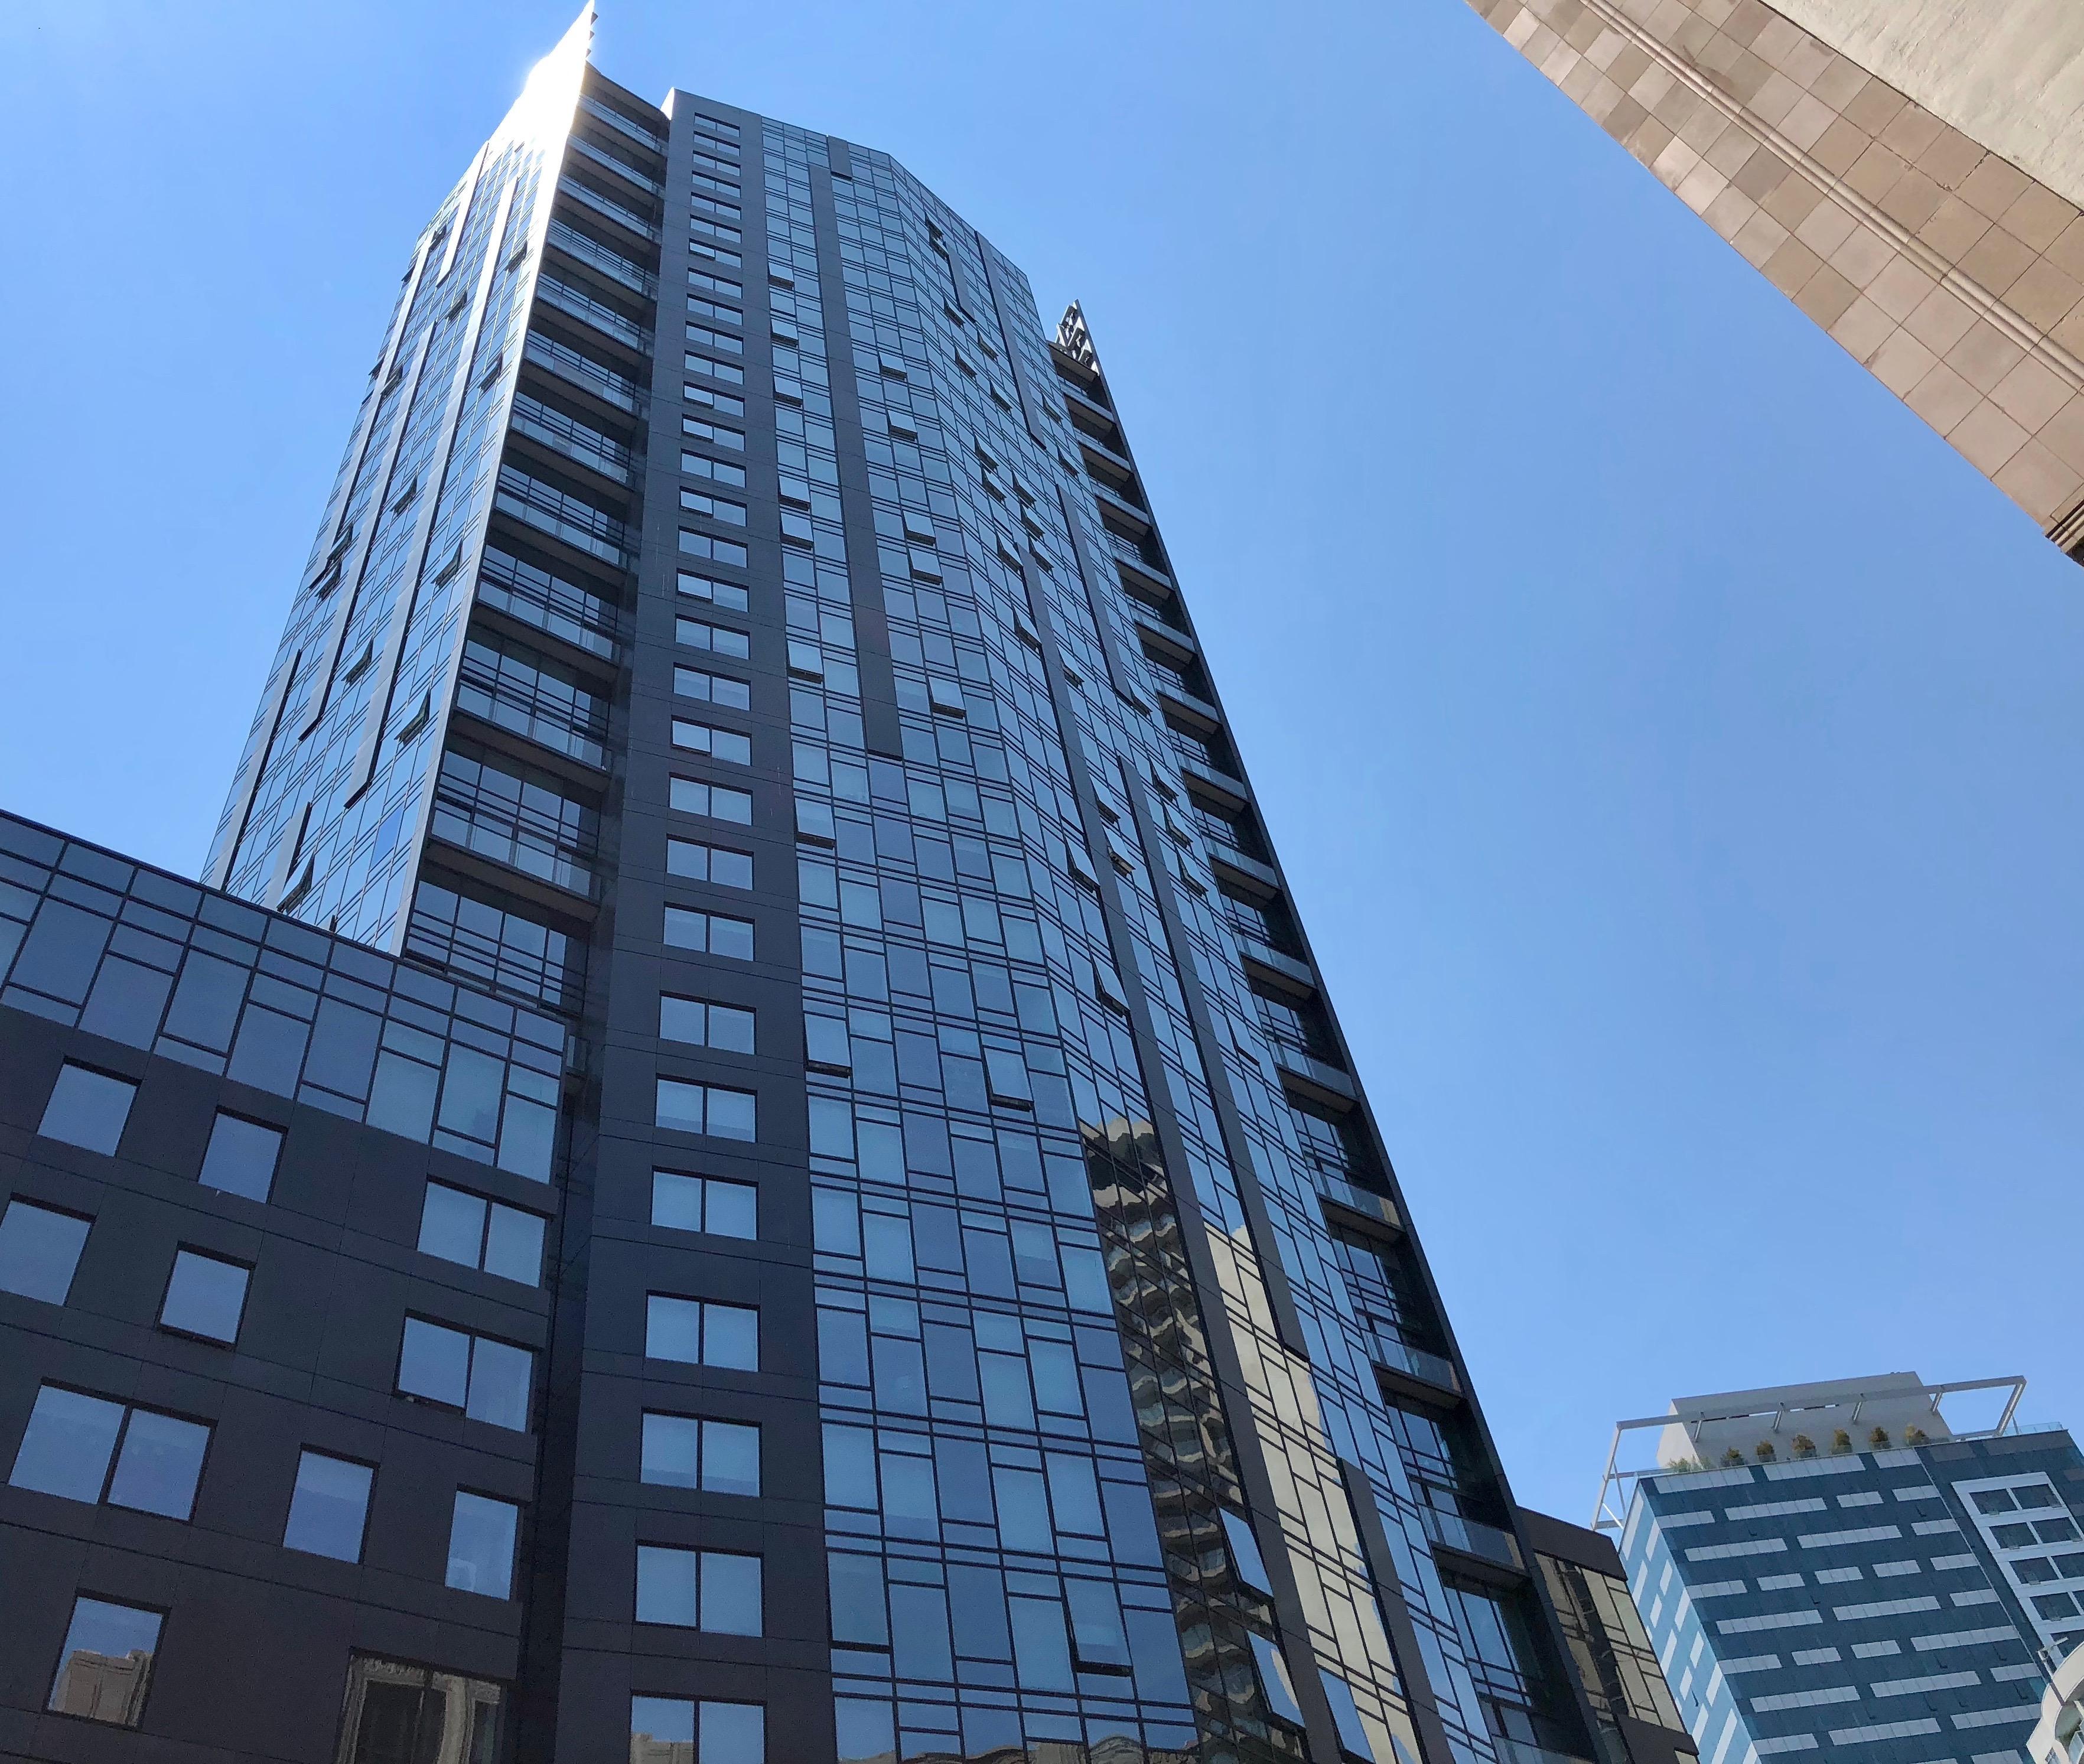 Tall glass facade high-rise